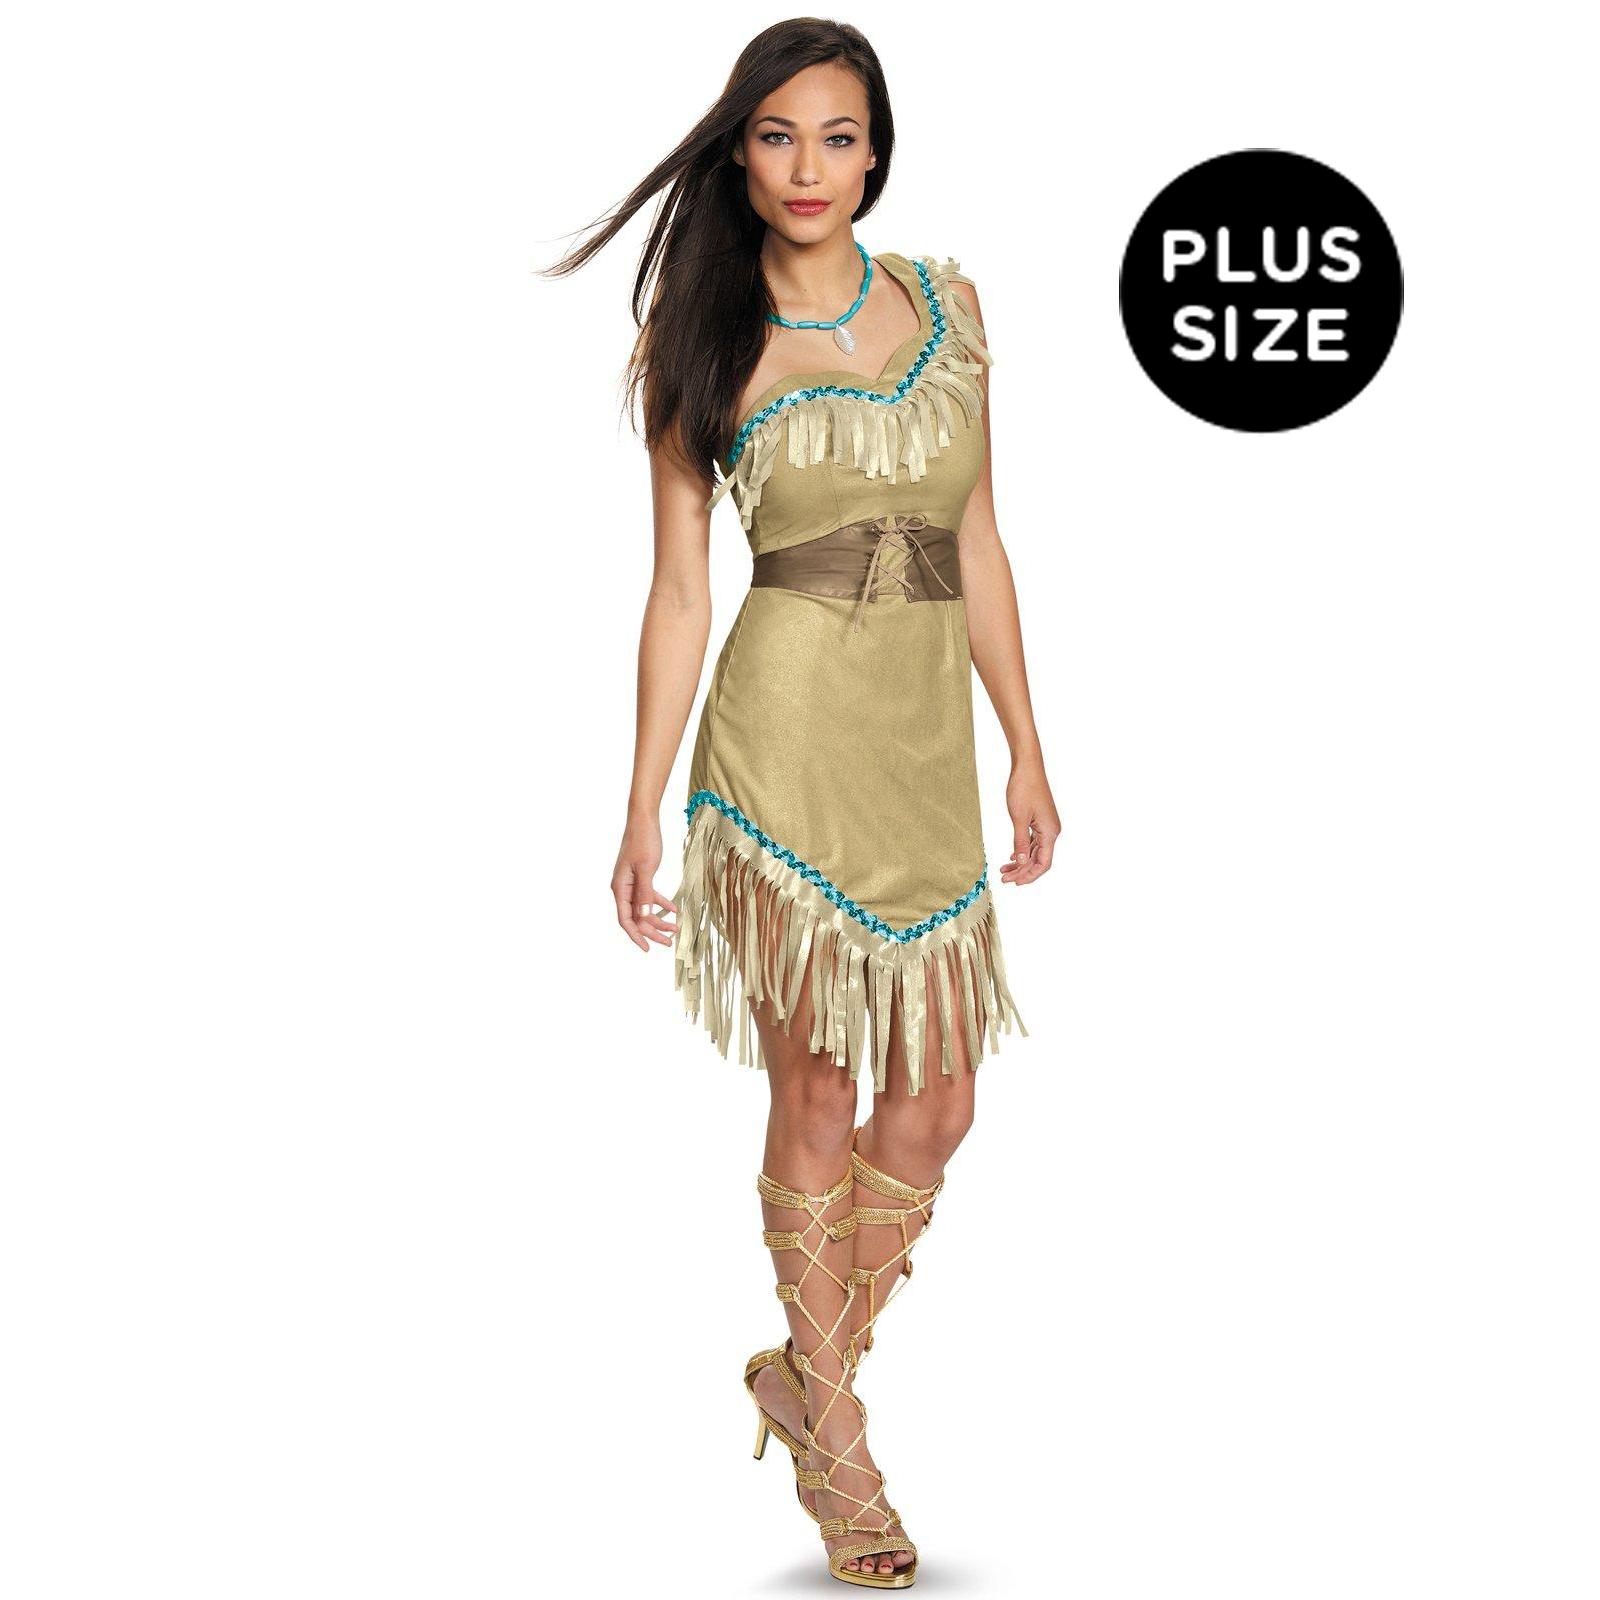 Disney Princess Deluxe Pocahontas Plus Size Costume For Women ...